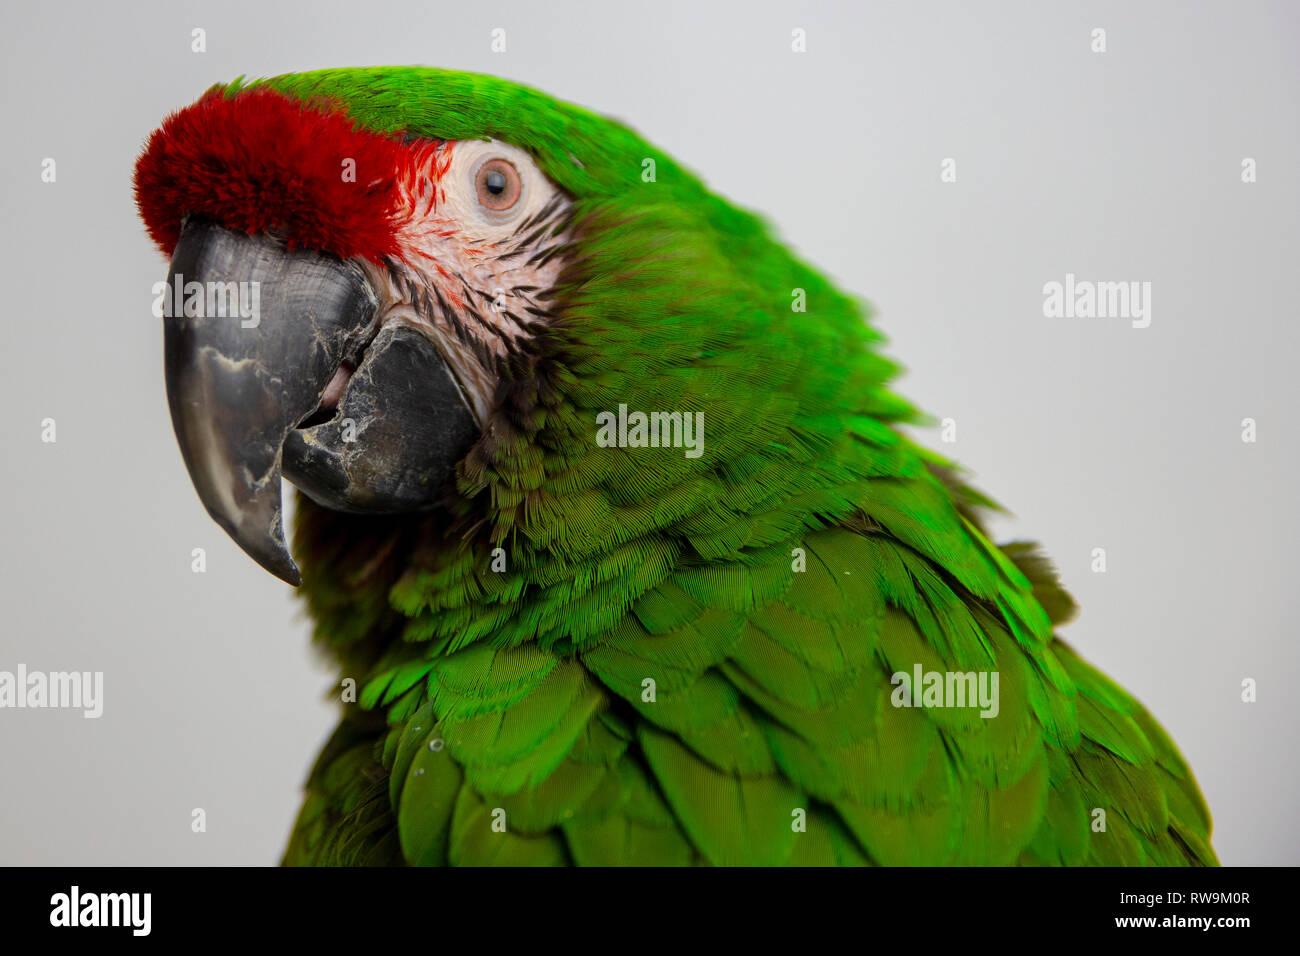 Military Macaw - Ara militaris, large beautiful green parrot Stock Photo